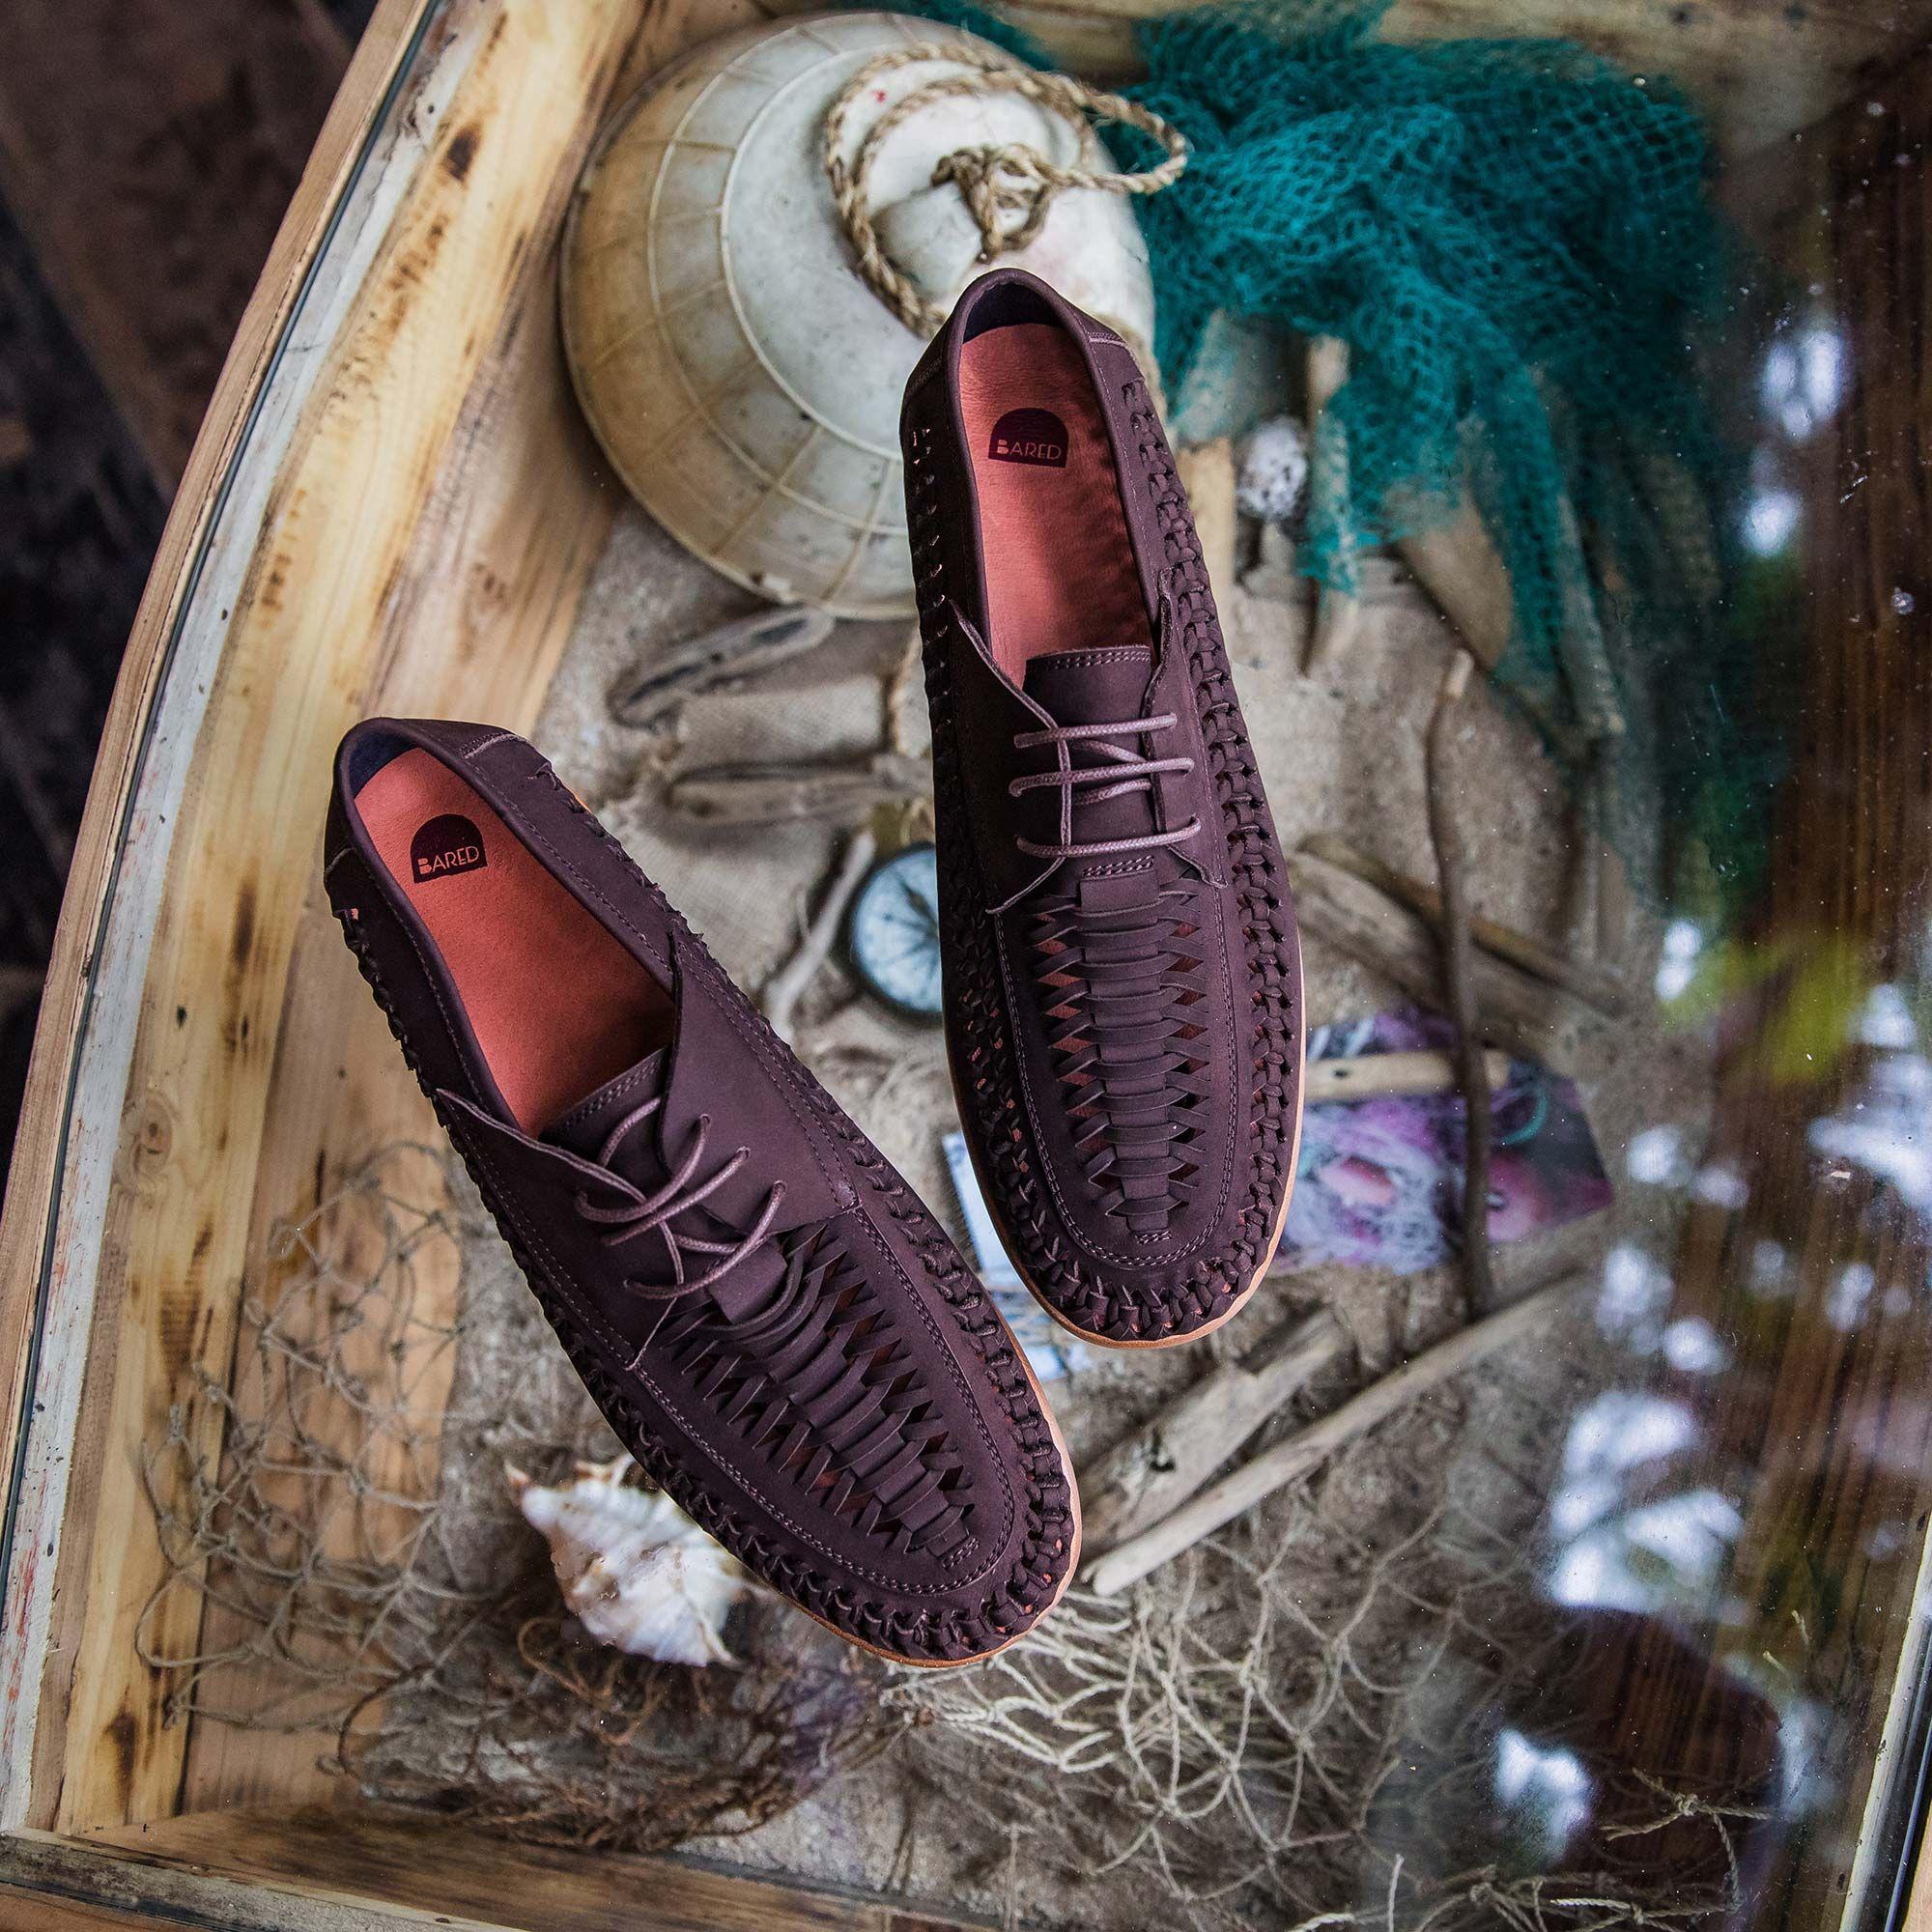 Bared_Footwear_La_Brisa_Bali_Travel_Summer_Mens_Campaign_Potassium_Chocolate_Woven_Lace_Ups